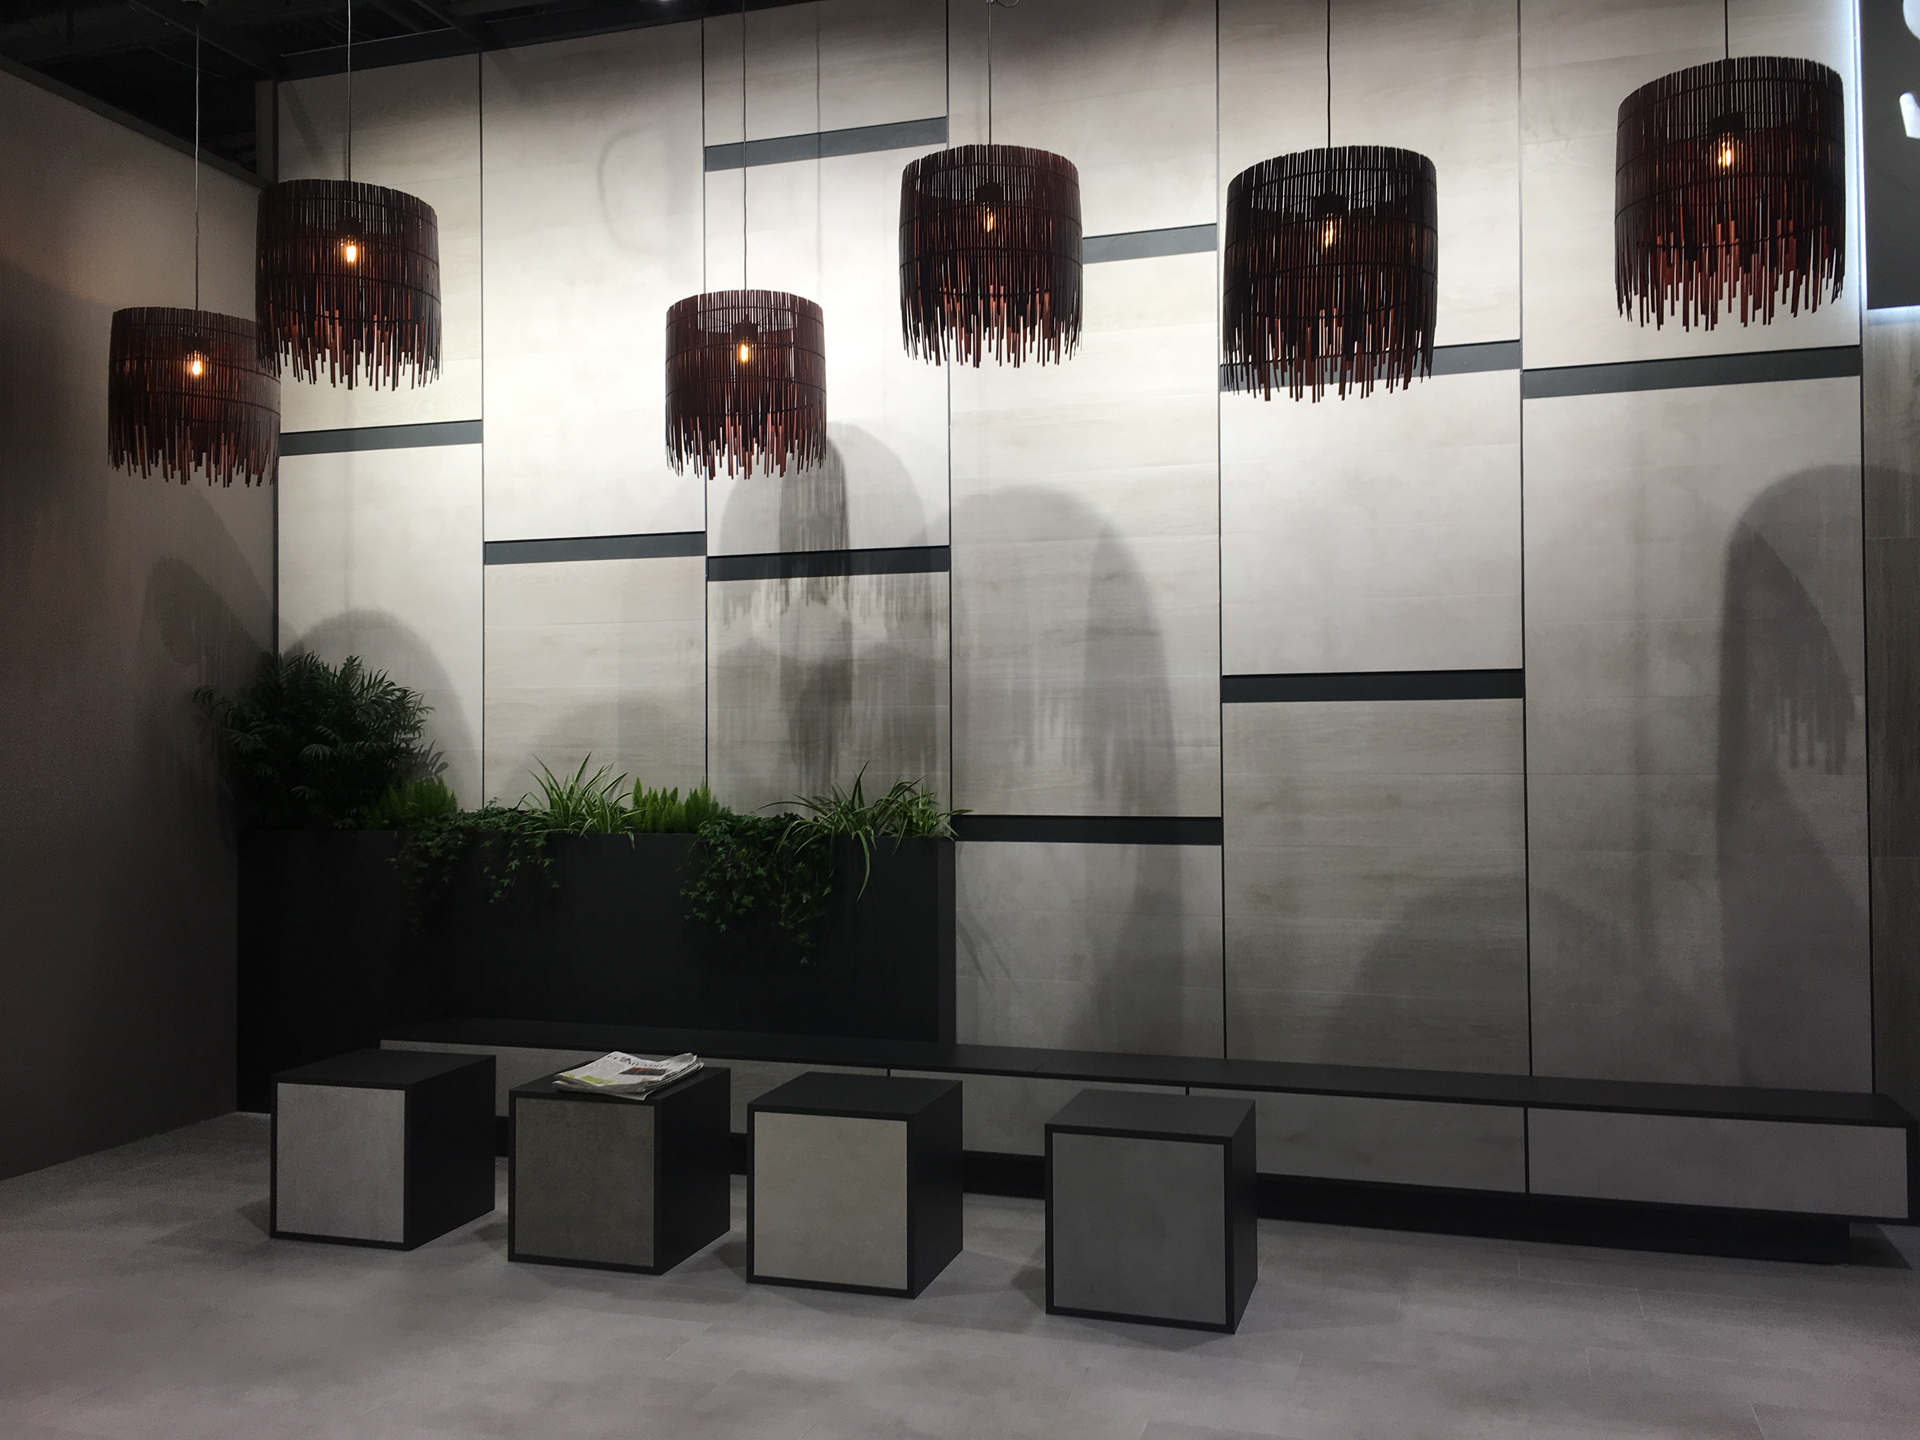 feria-cevisama-valencia-2018-decoracion-interiorismo-2